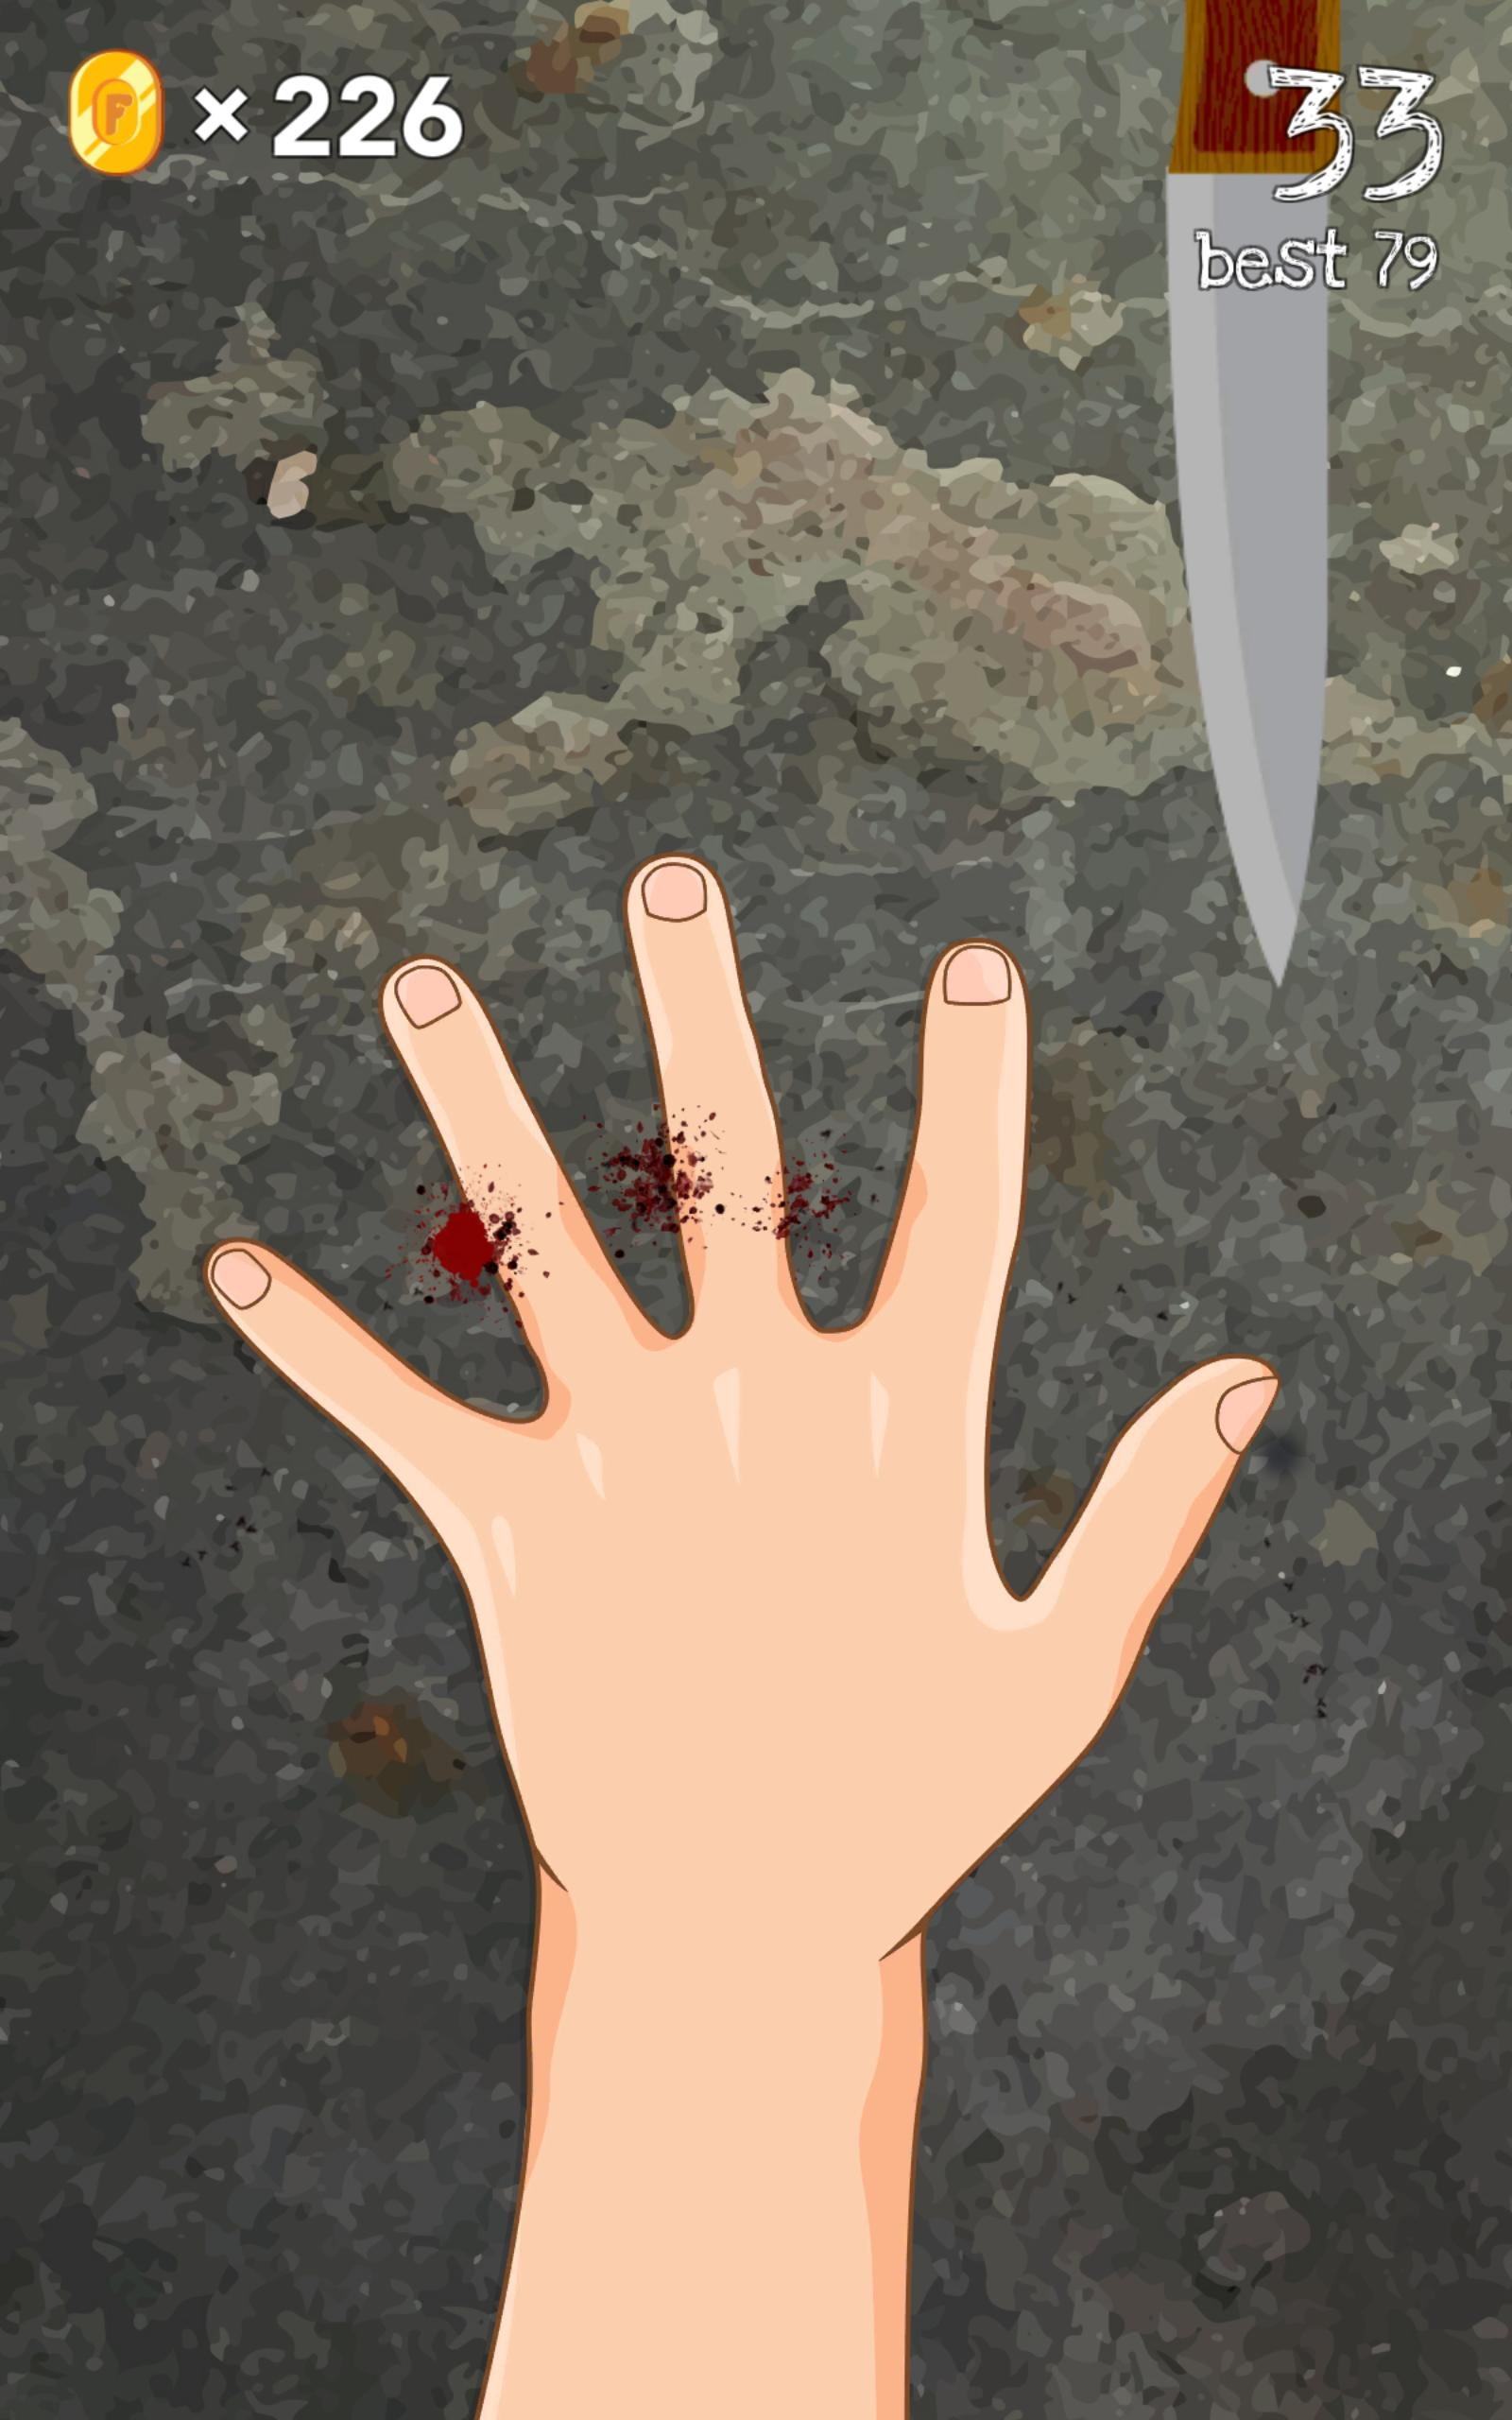 4 Fingers - free knife games 3.4 Screenshot 10